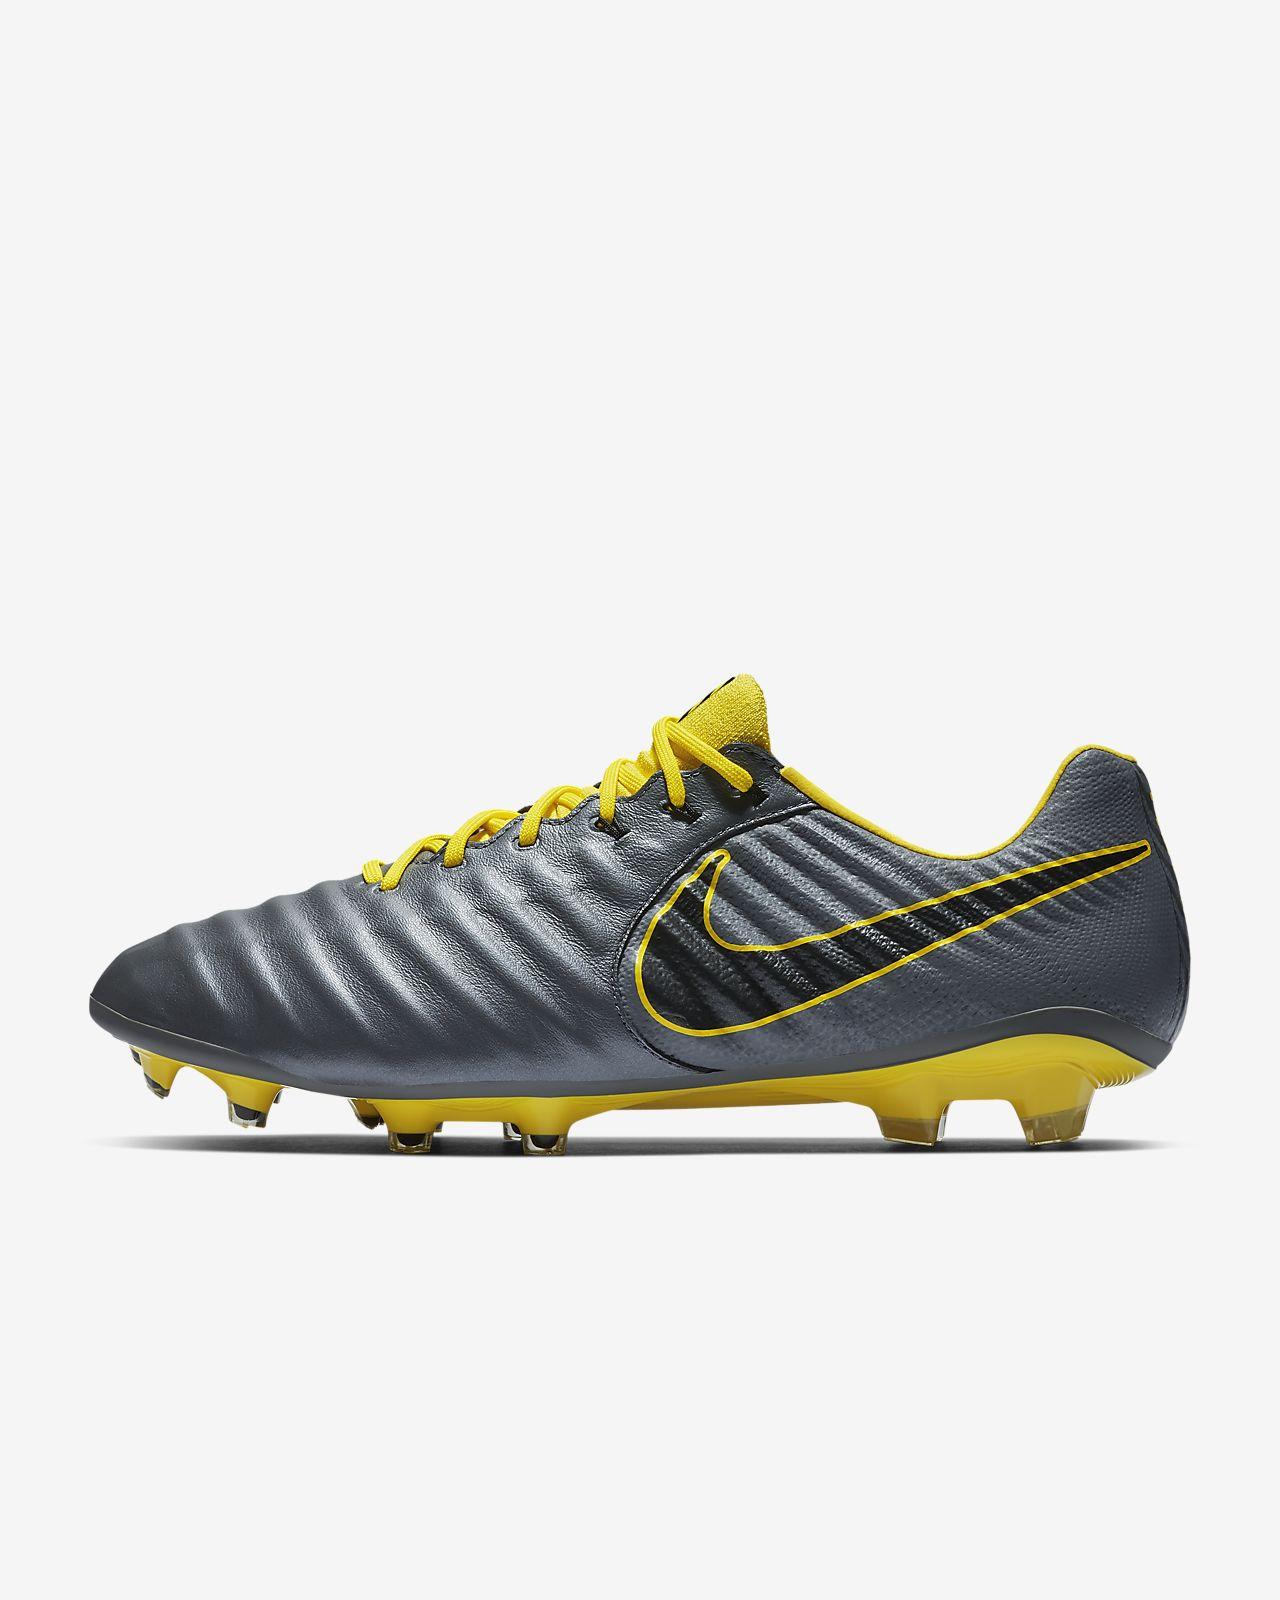 Nike Legend 7 Elite FG Game Over Botas de fútbol para terreno firme ... 0f46240a34dac